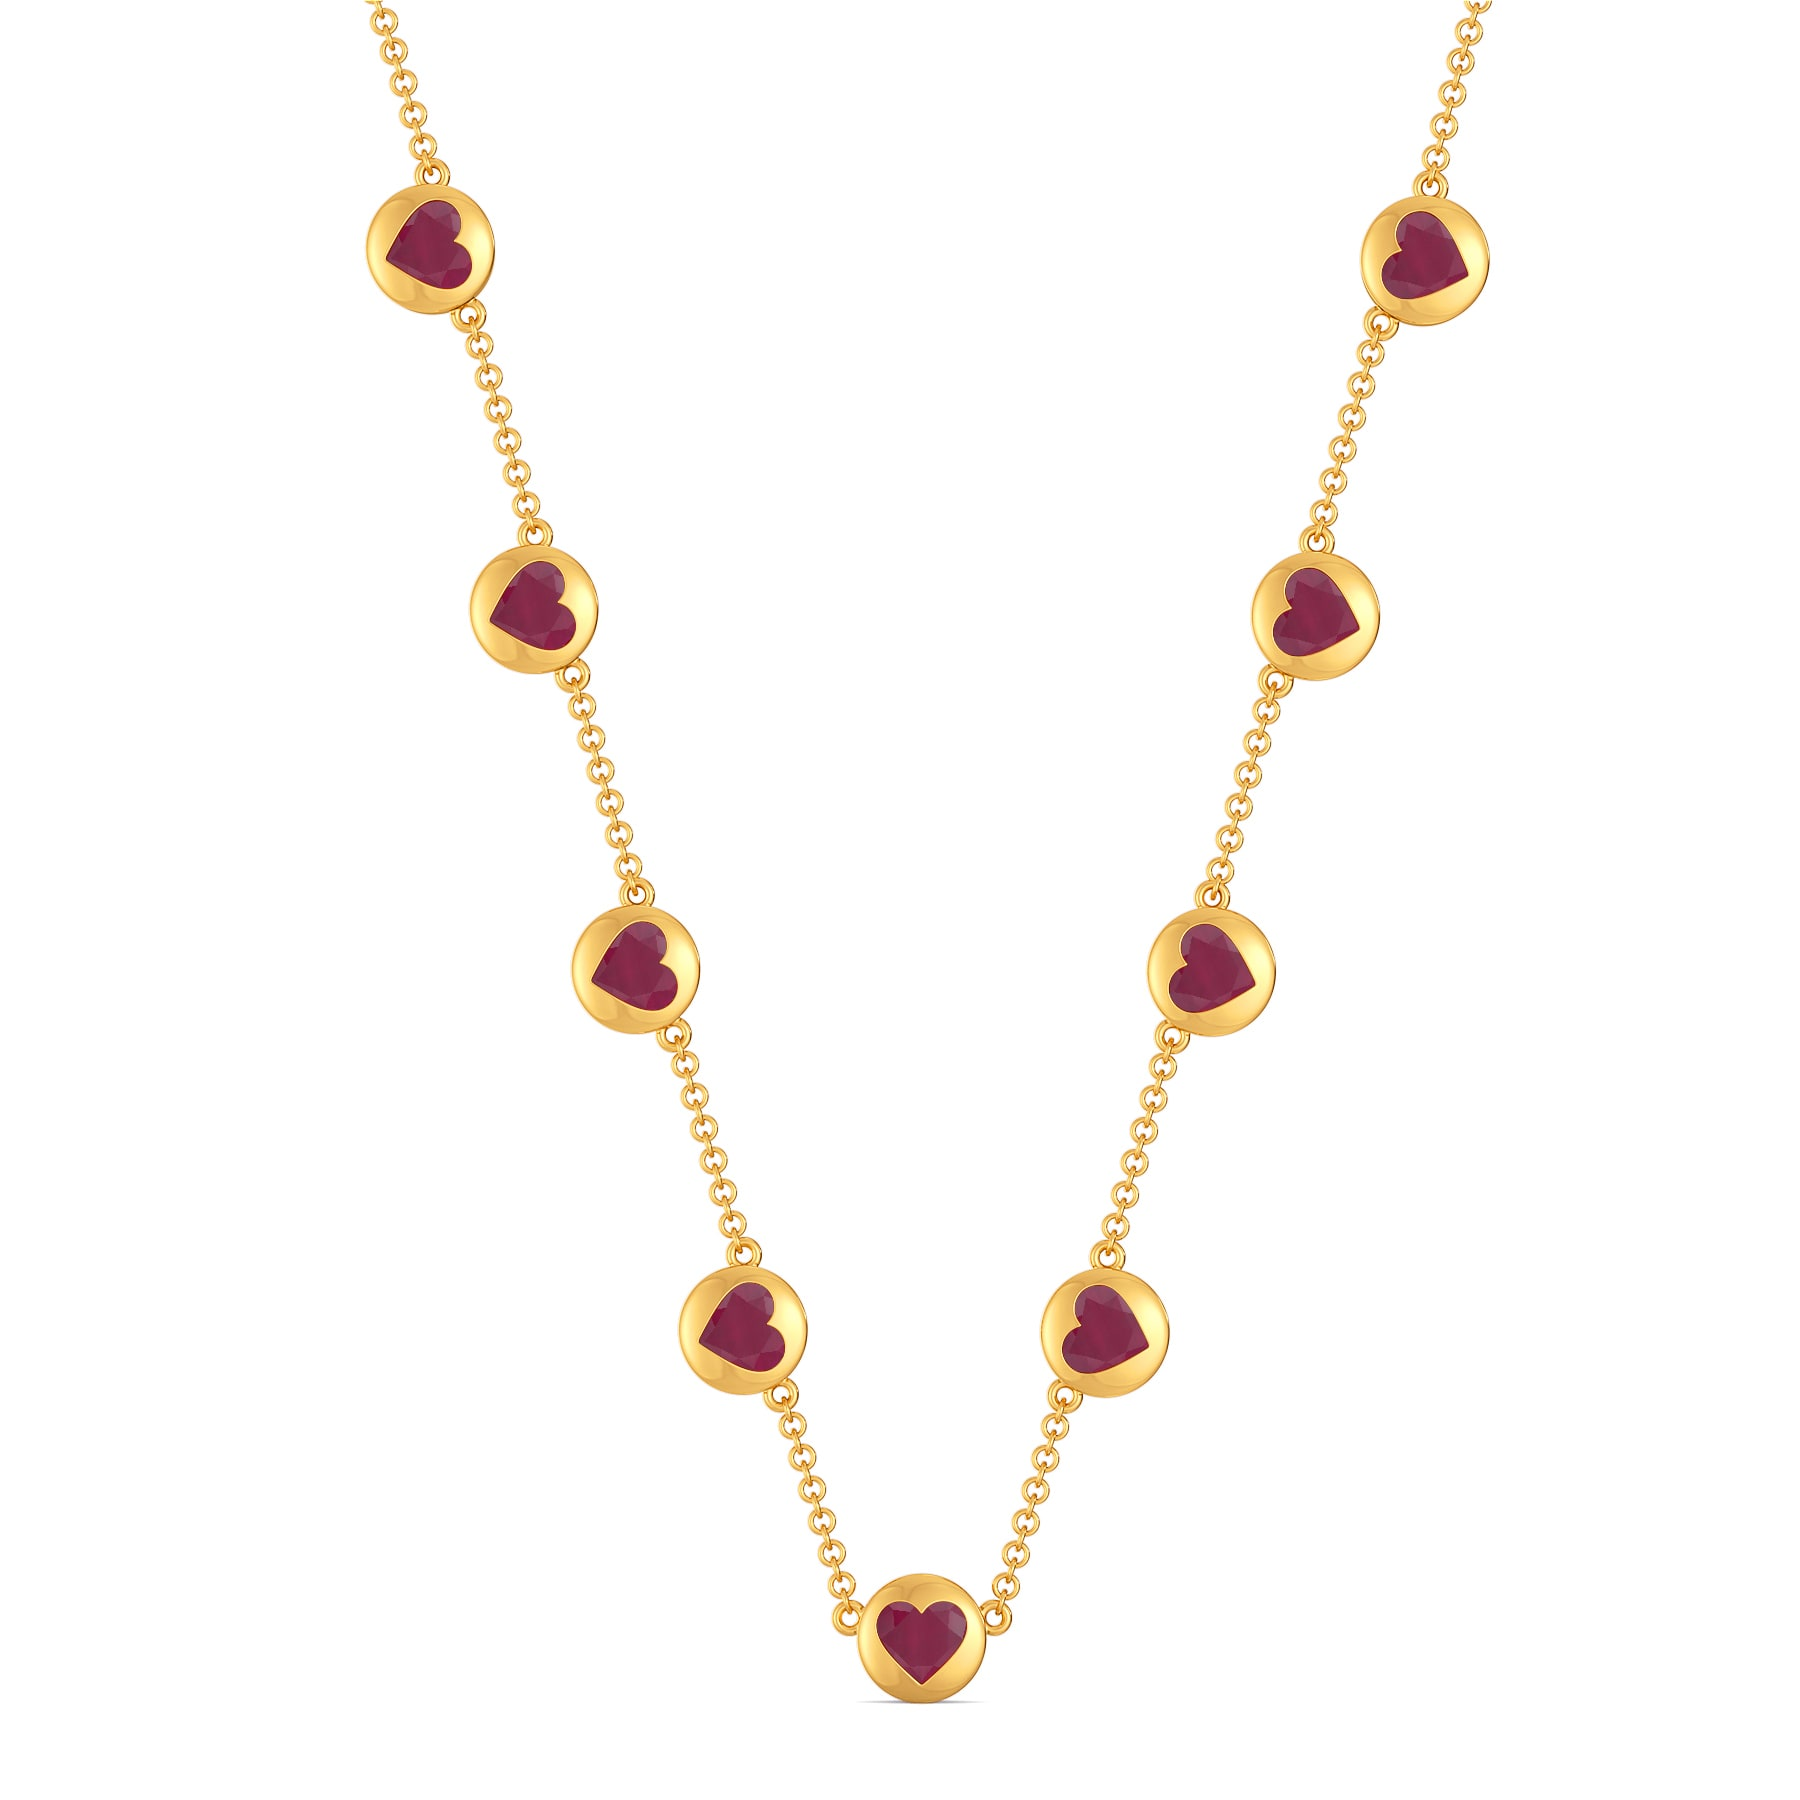 Queen of Hearts Gemstone Necklaces